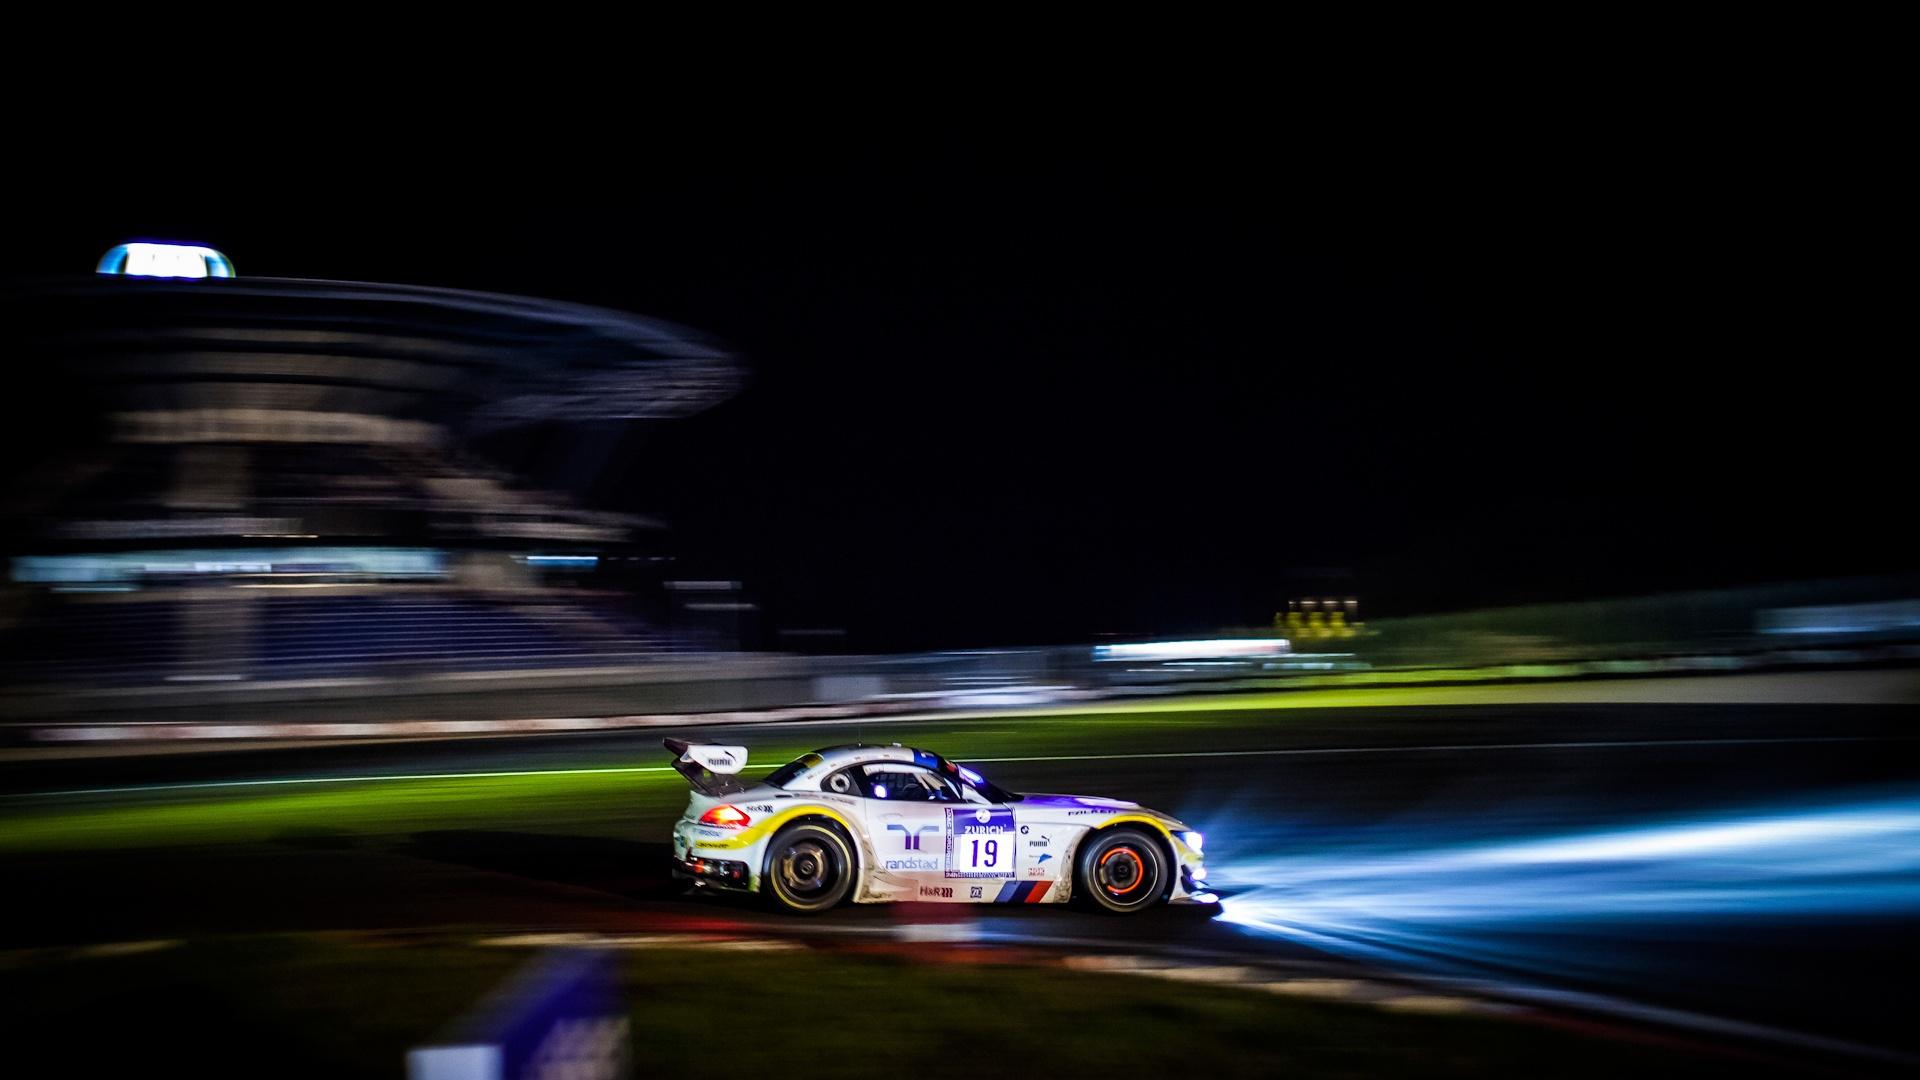 wallpaper racing car office - photo #15